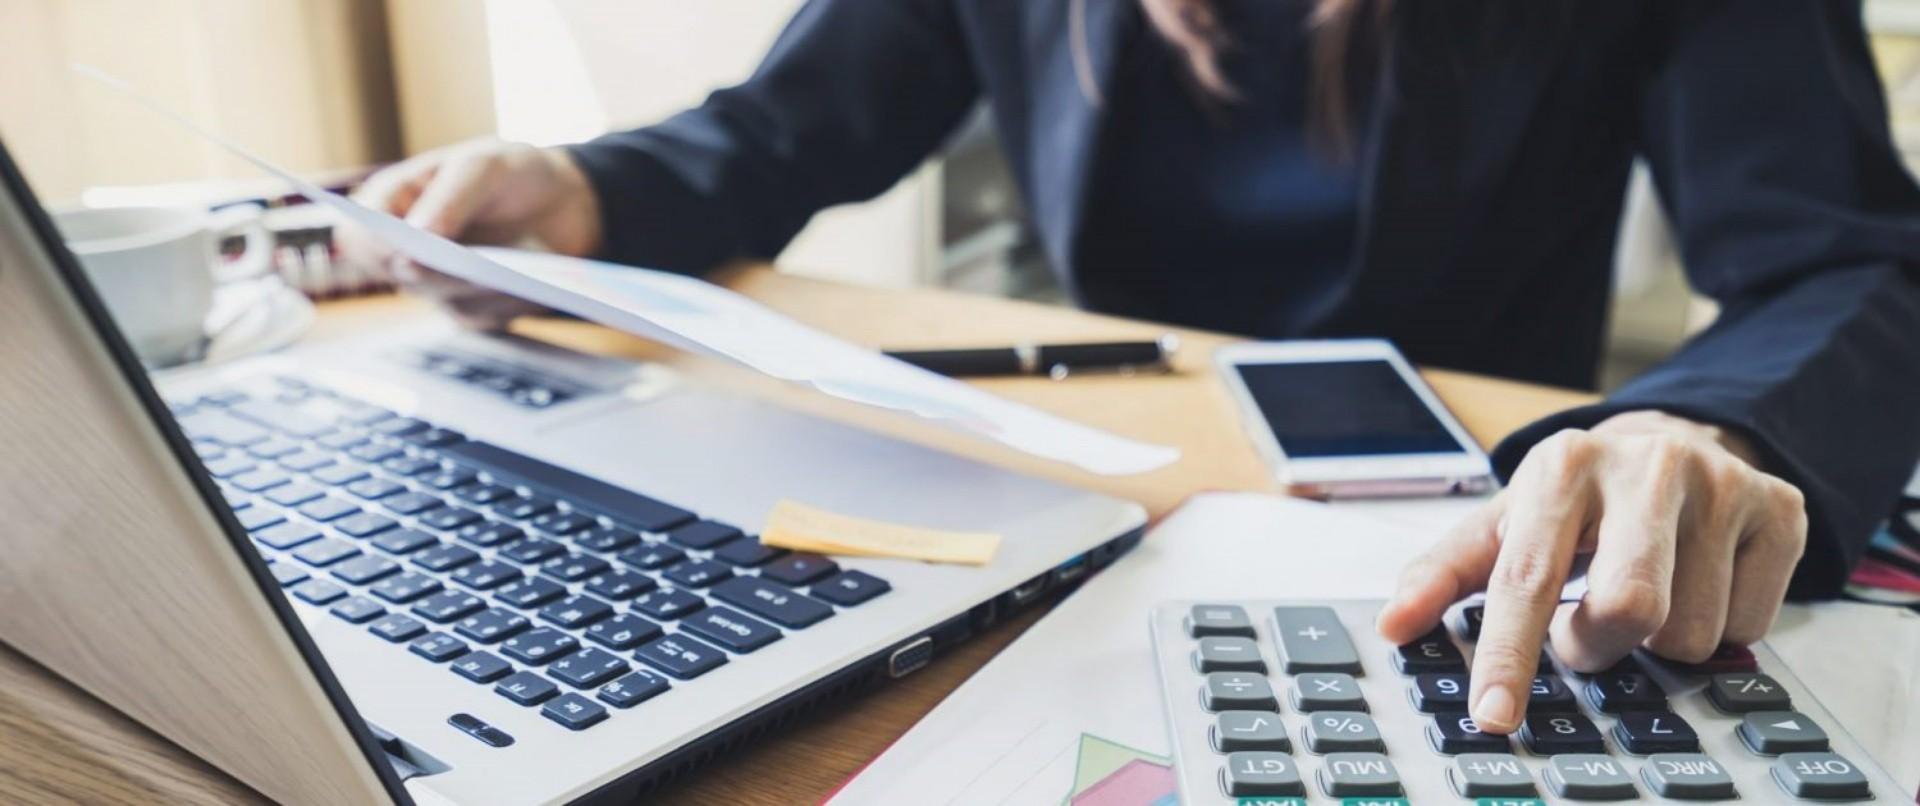 Interviu cu Corlan Bogdana Nicoleta, expert contabil și auditor financiar